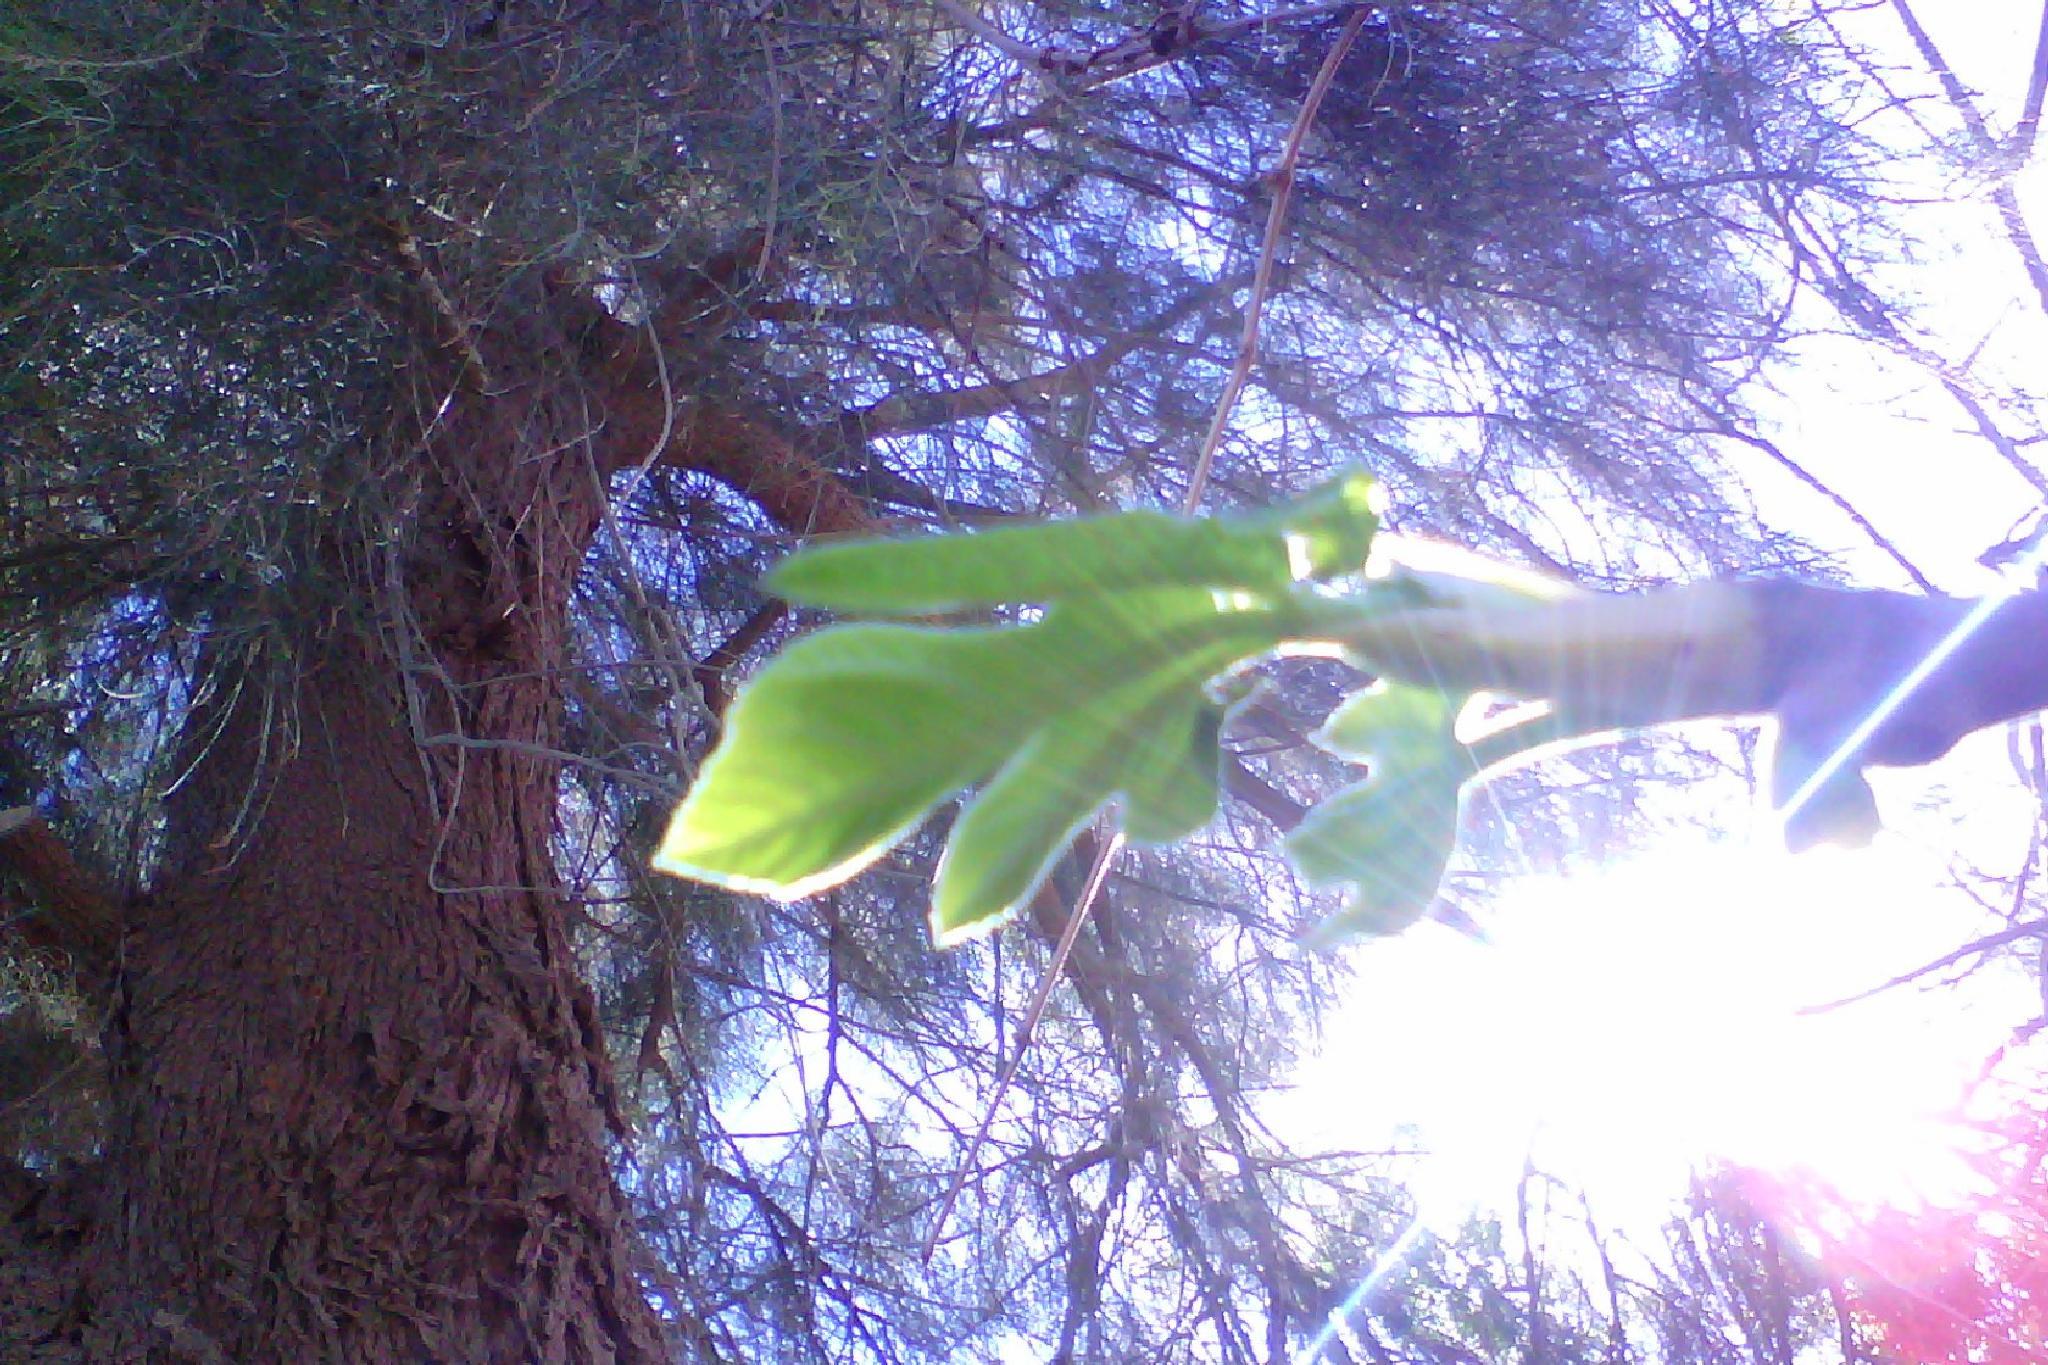 wanderfull natirol and sun by hocine.bernaoui